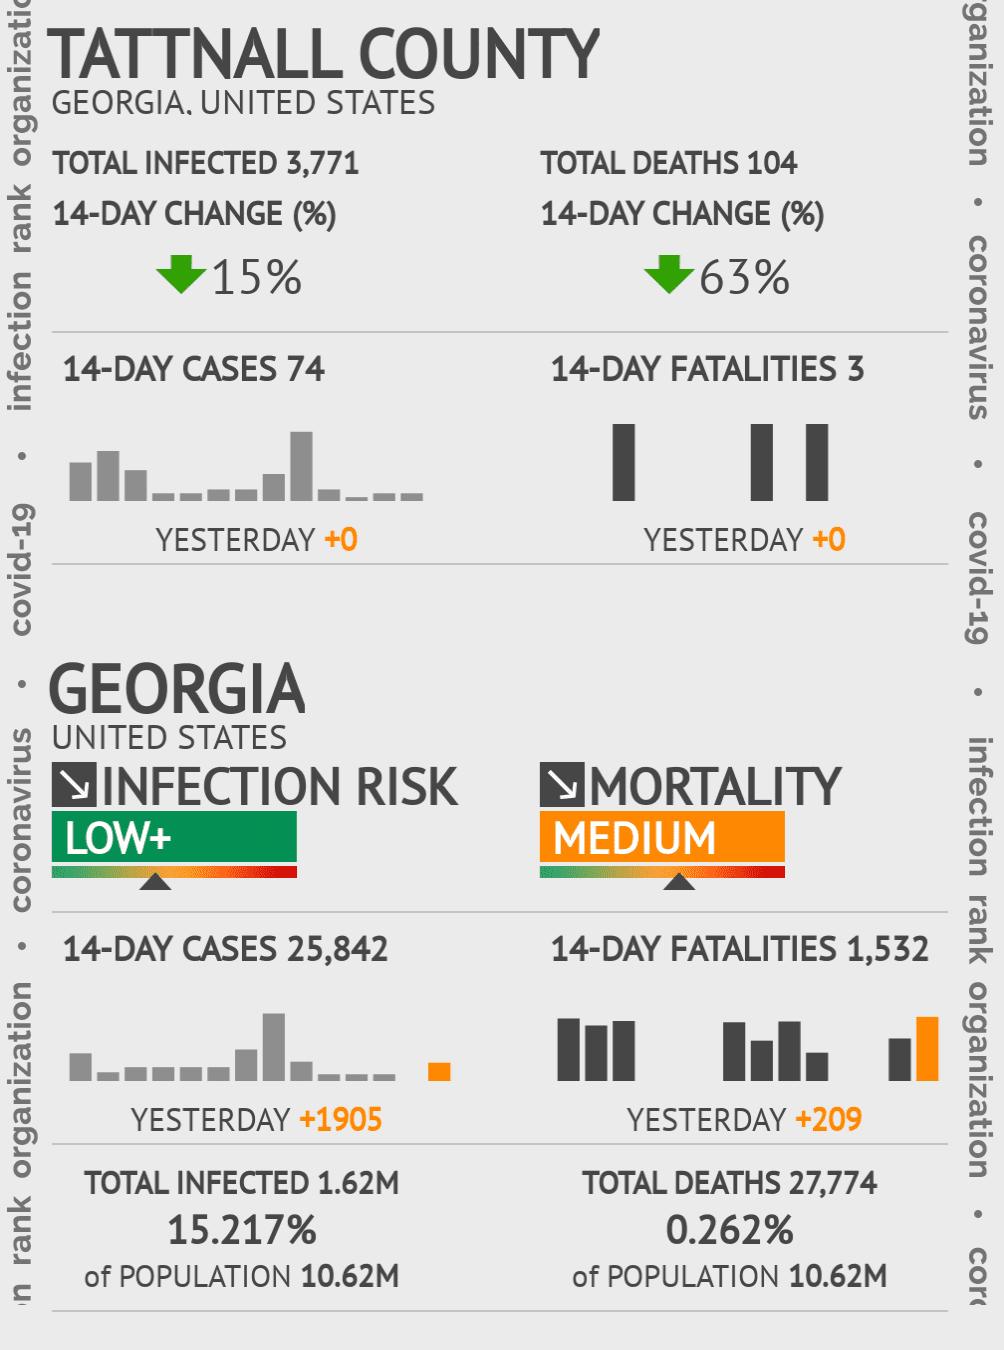 Tattnall County Coronavirus Covid-19 Risk of Infection on February 25, 2021